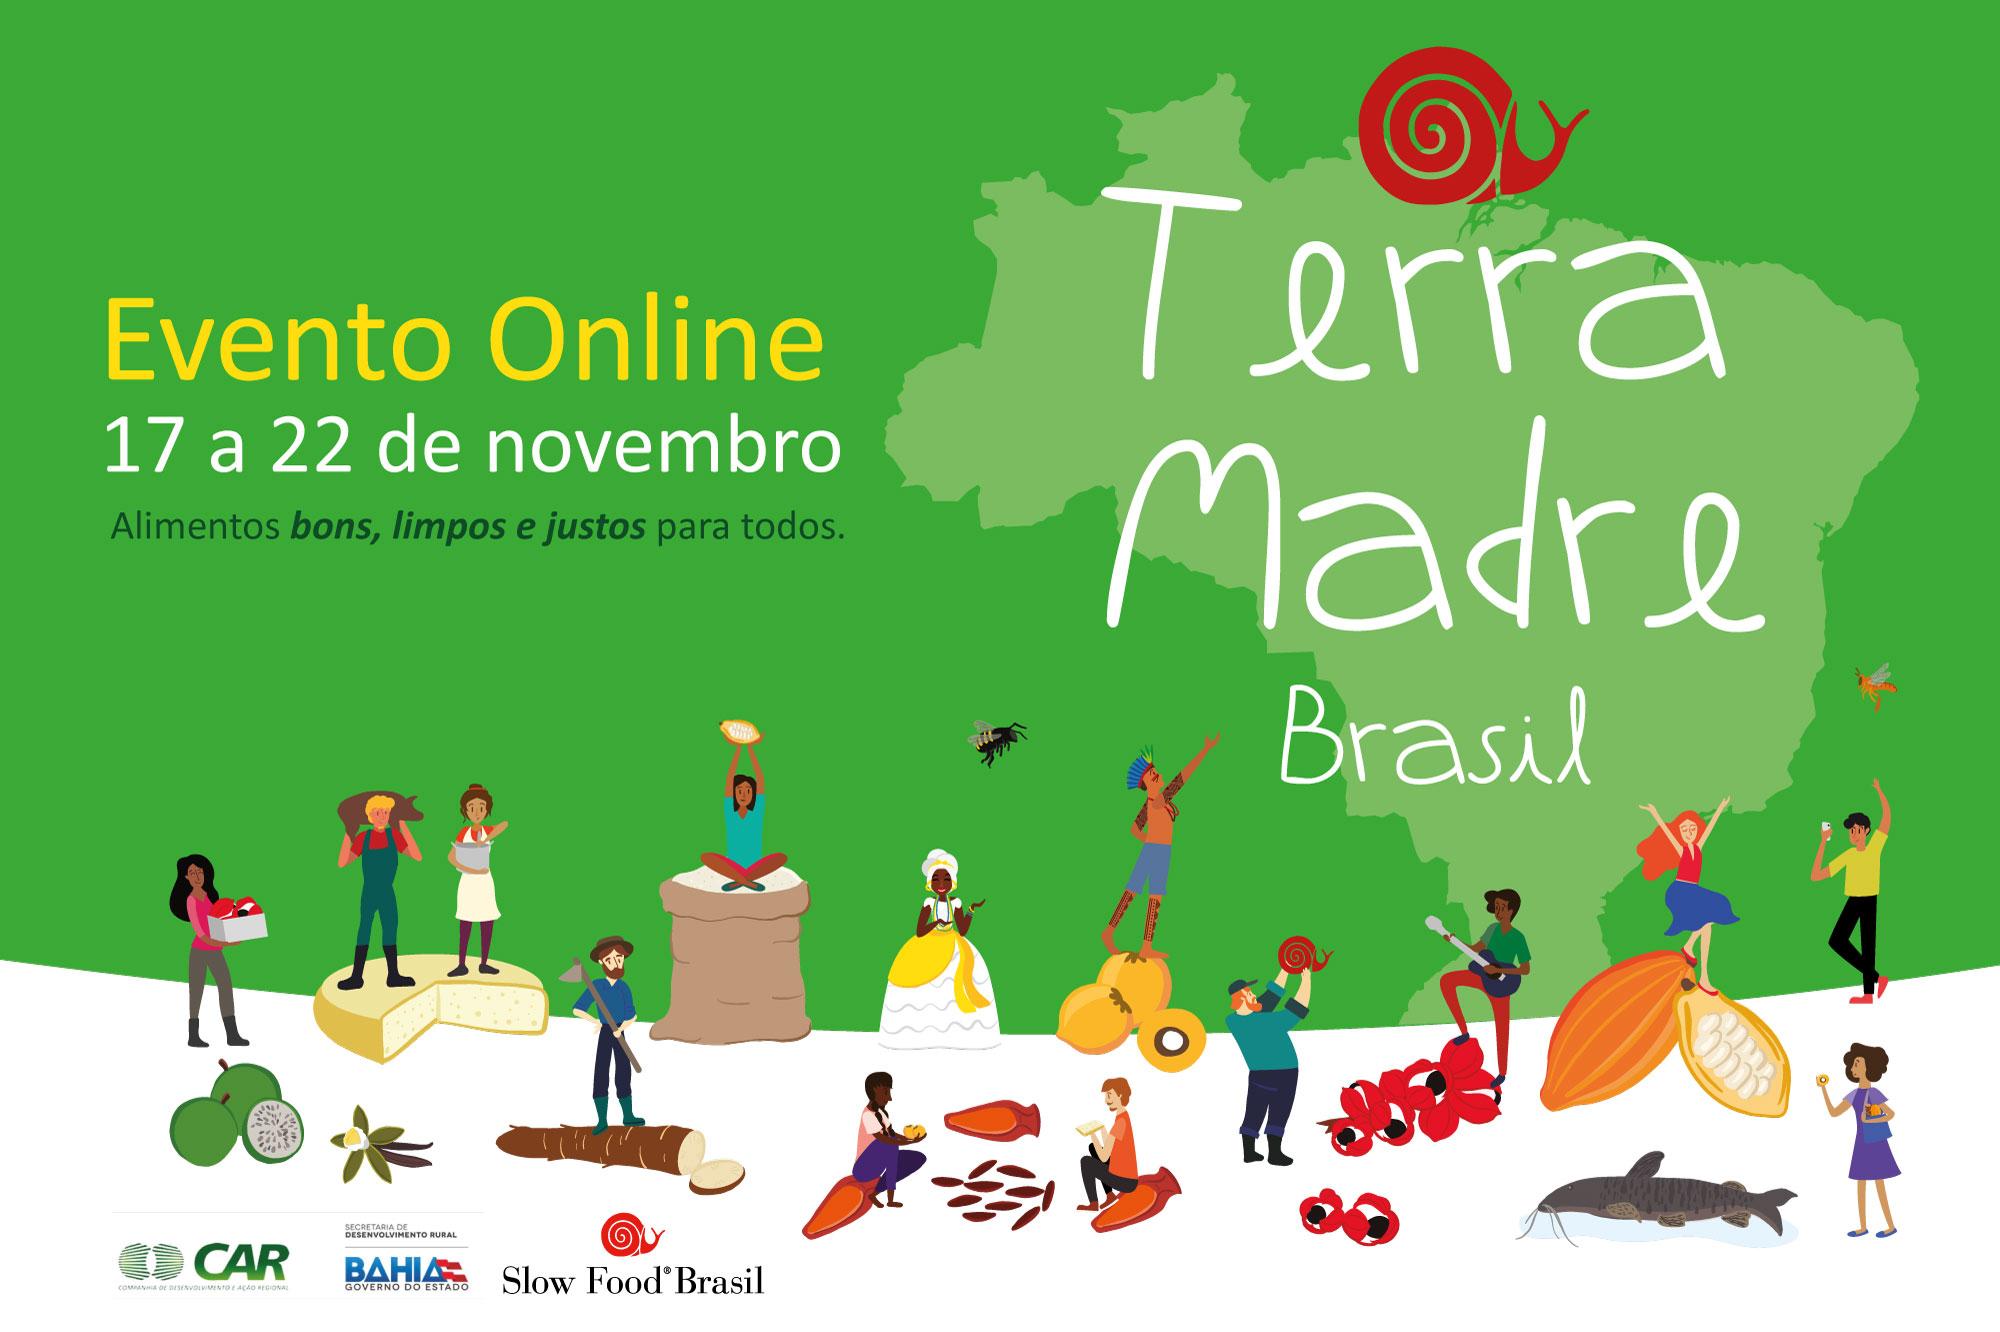 Boletim 2 Slow Food Brasil – Falta só mais um mês para o Terra Madre Brasil 2020